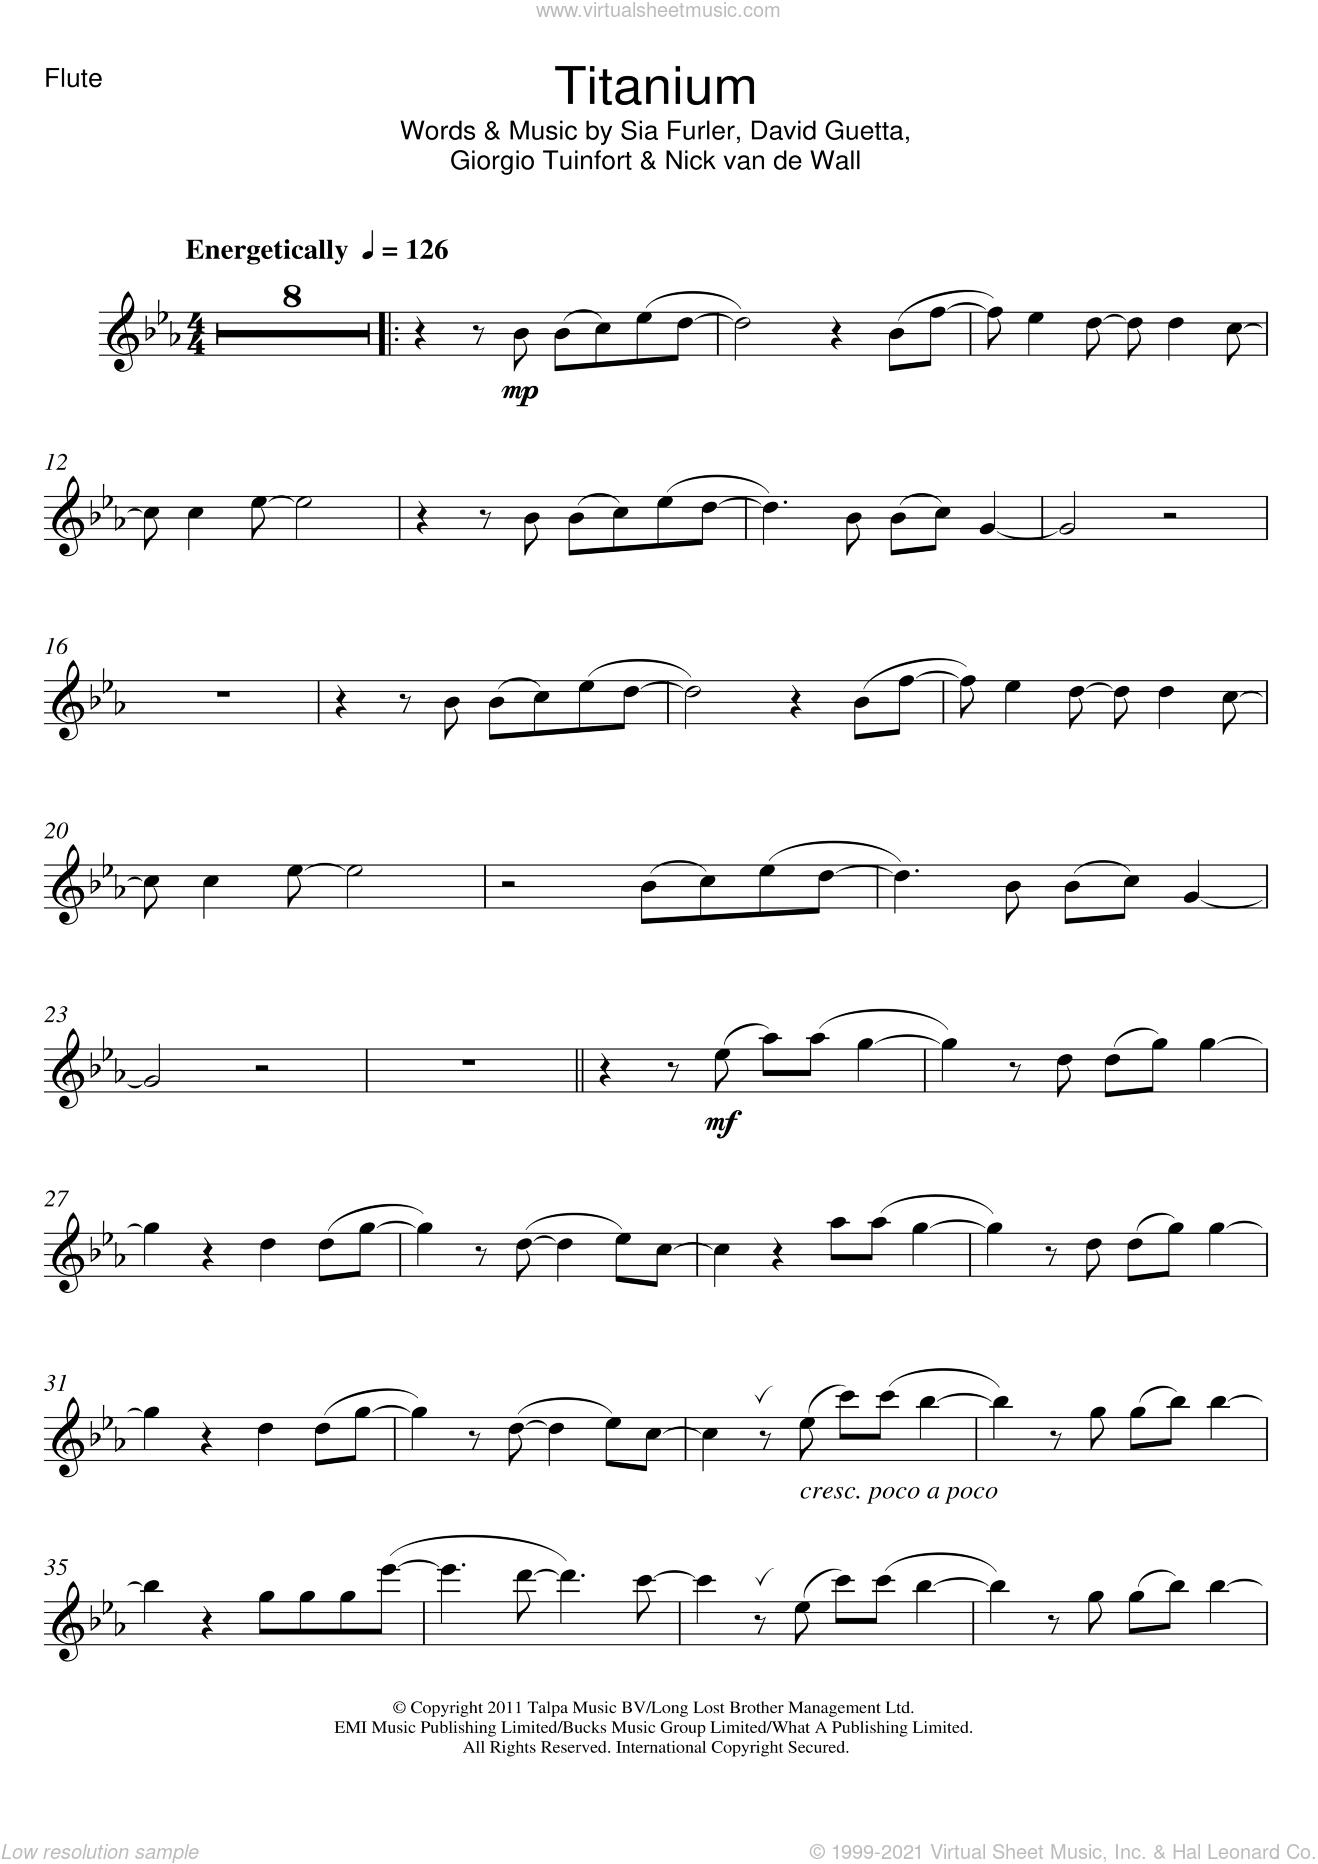 Titanium (featuring Sia) sheet music for flute solo by David Guetta, Sia, Giorgio Tuinfort, Nick van de Wall and Sia Furler, intermediate skill level